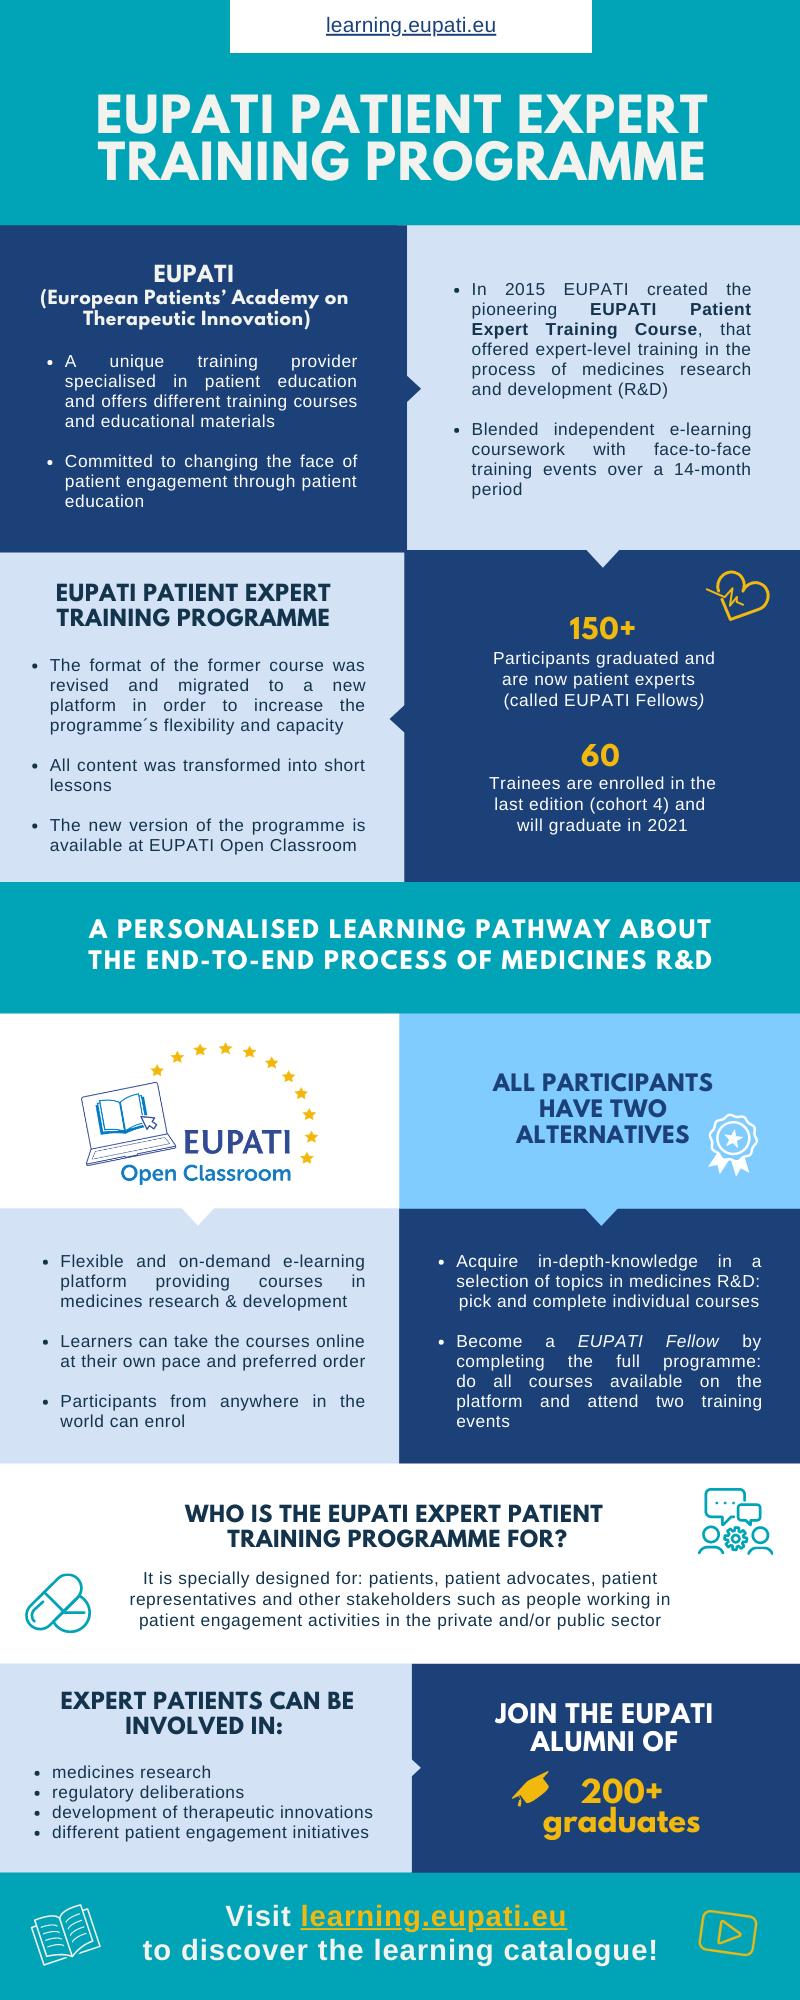 EUPATI Patient Expert Training Programme